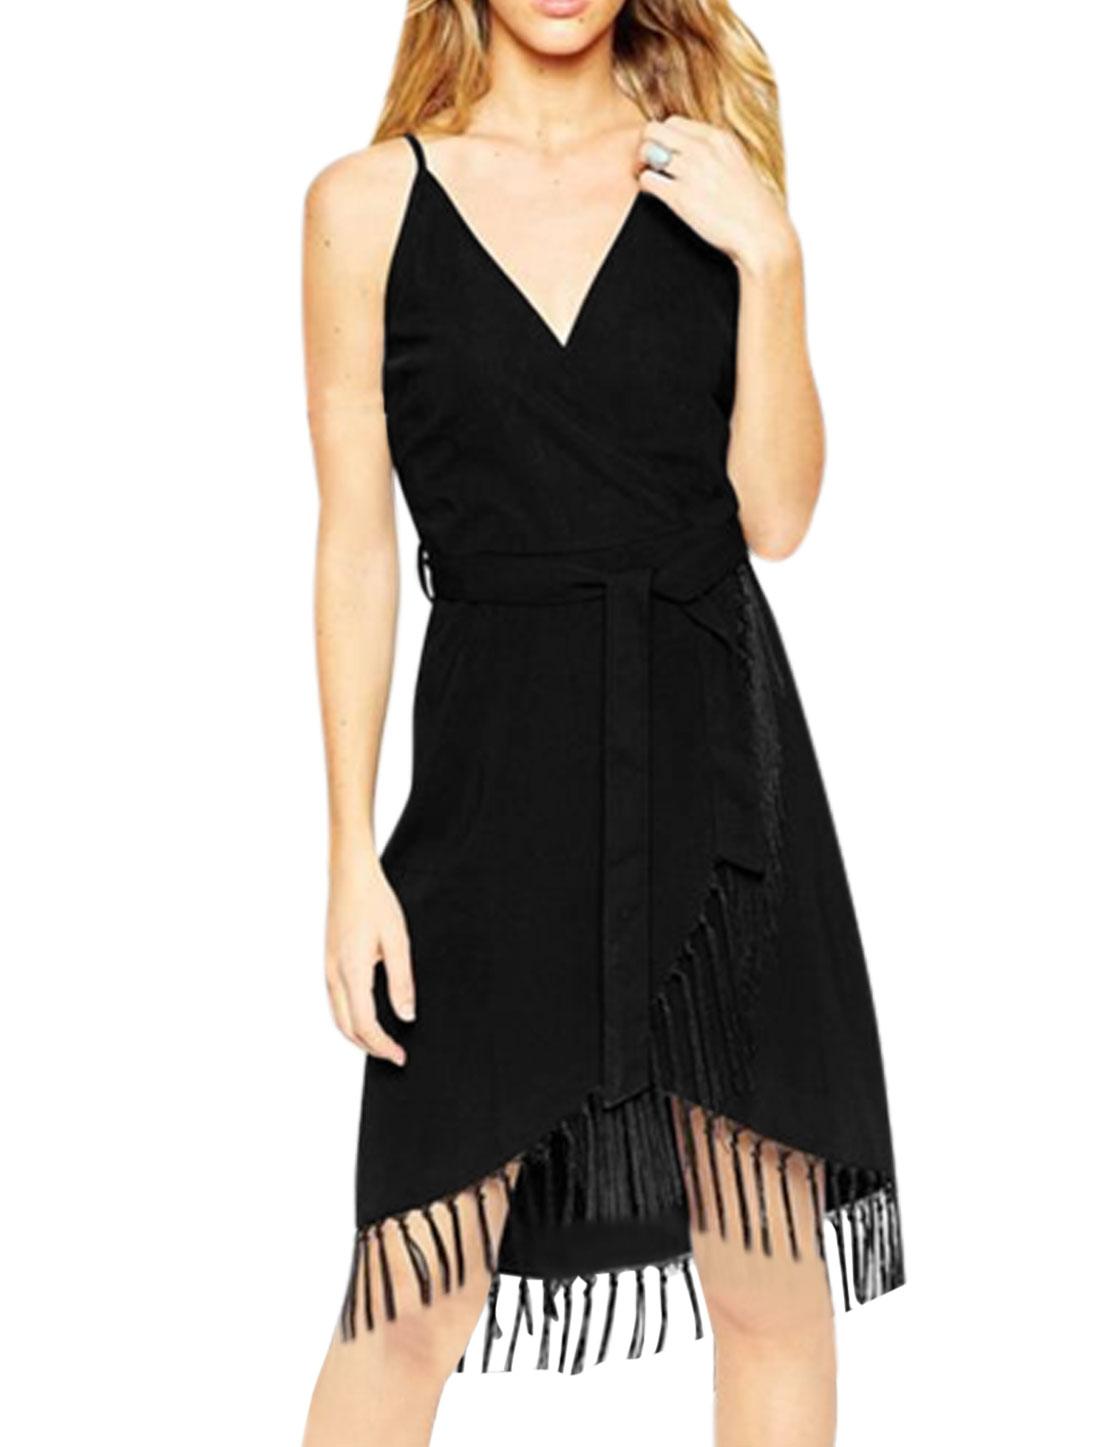 Women Crossover V Neck Spaghetti Strap Tassels Trim Casual Dresses Black M